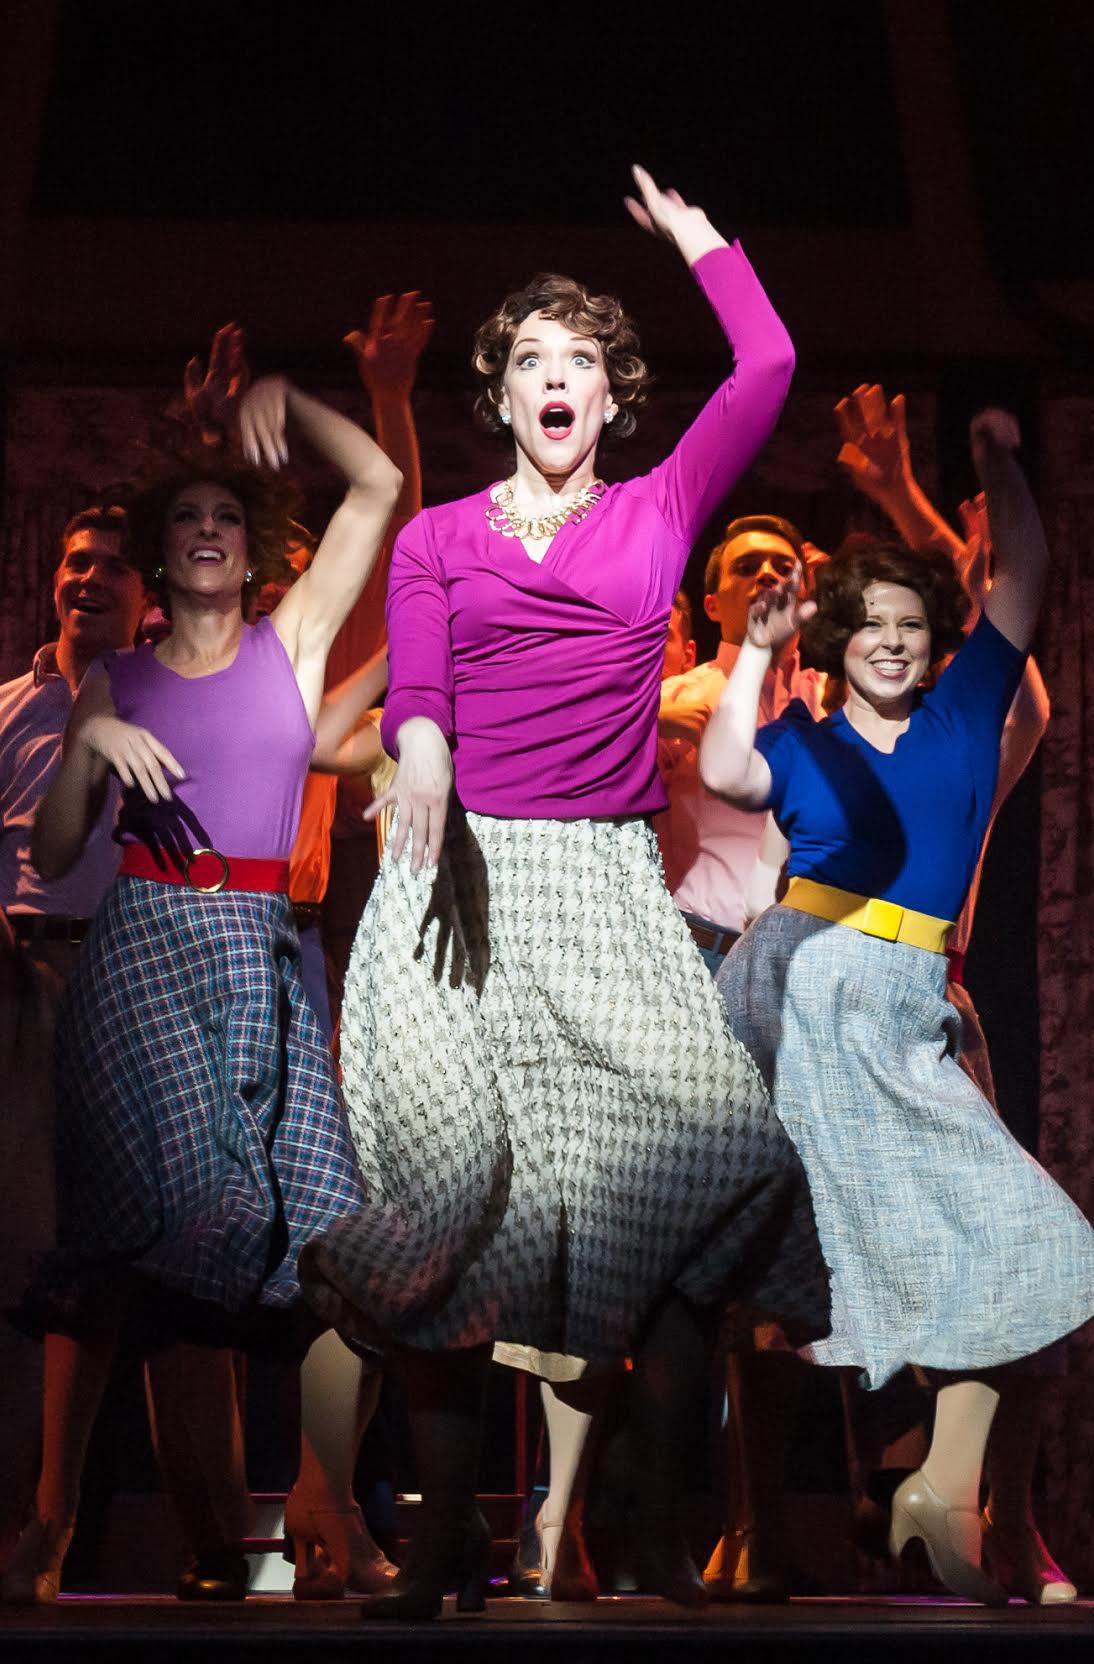 Emily in Mame at Virginia Repertory Theatre